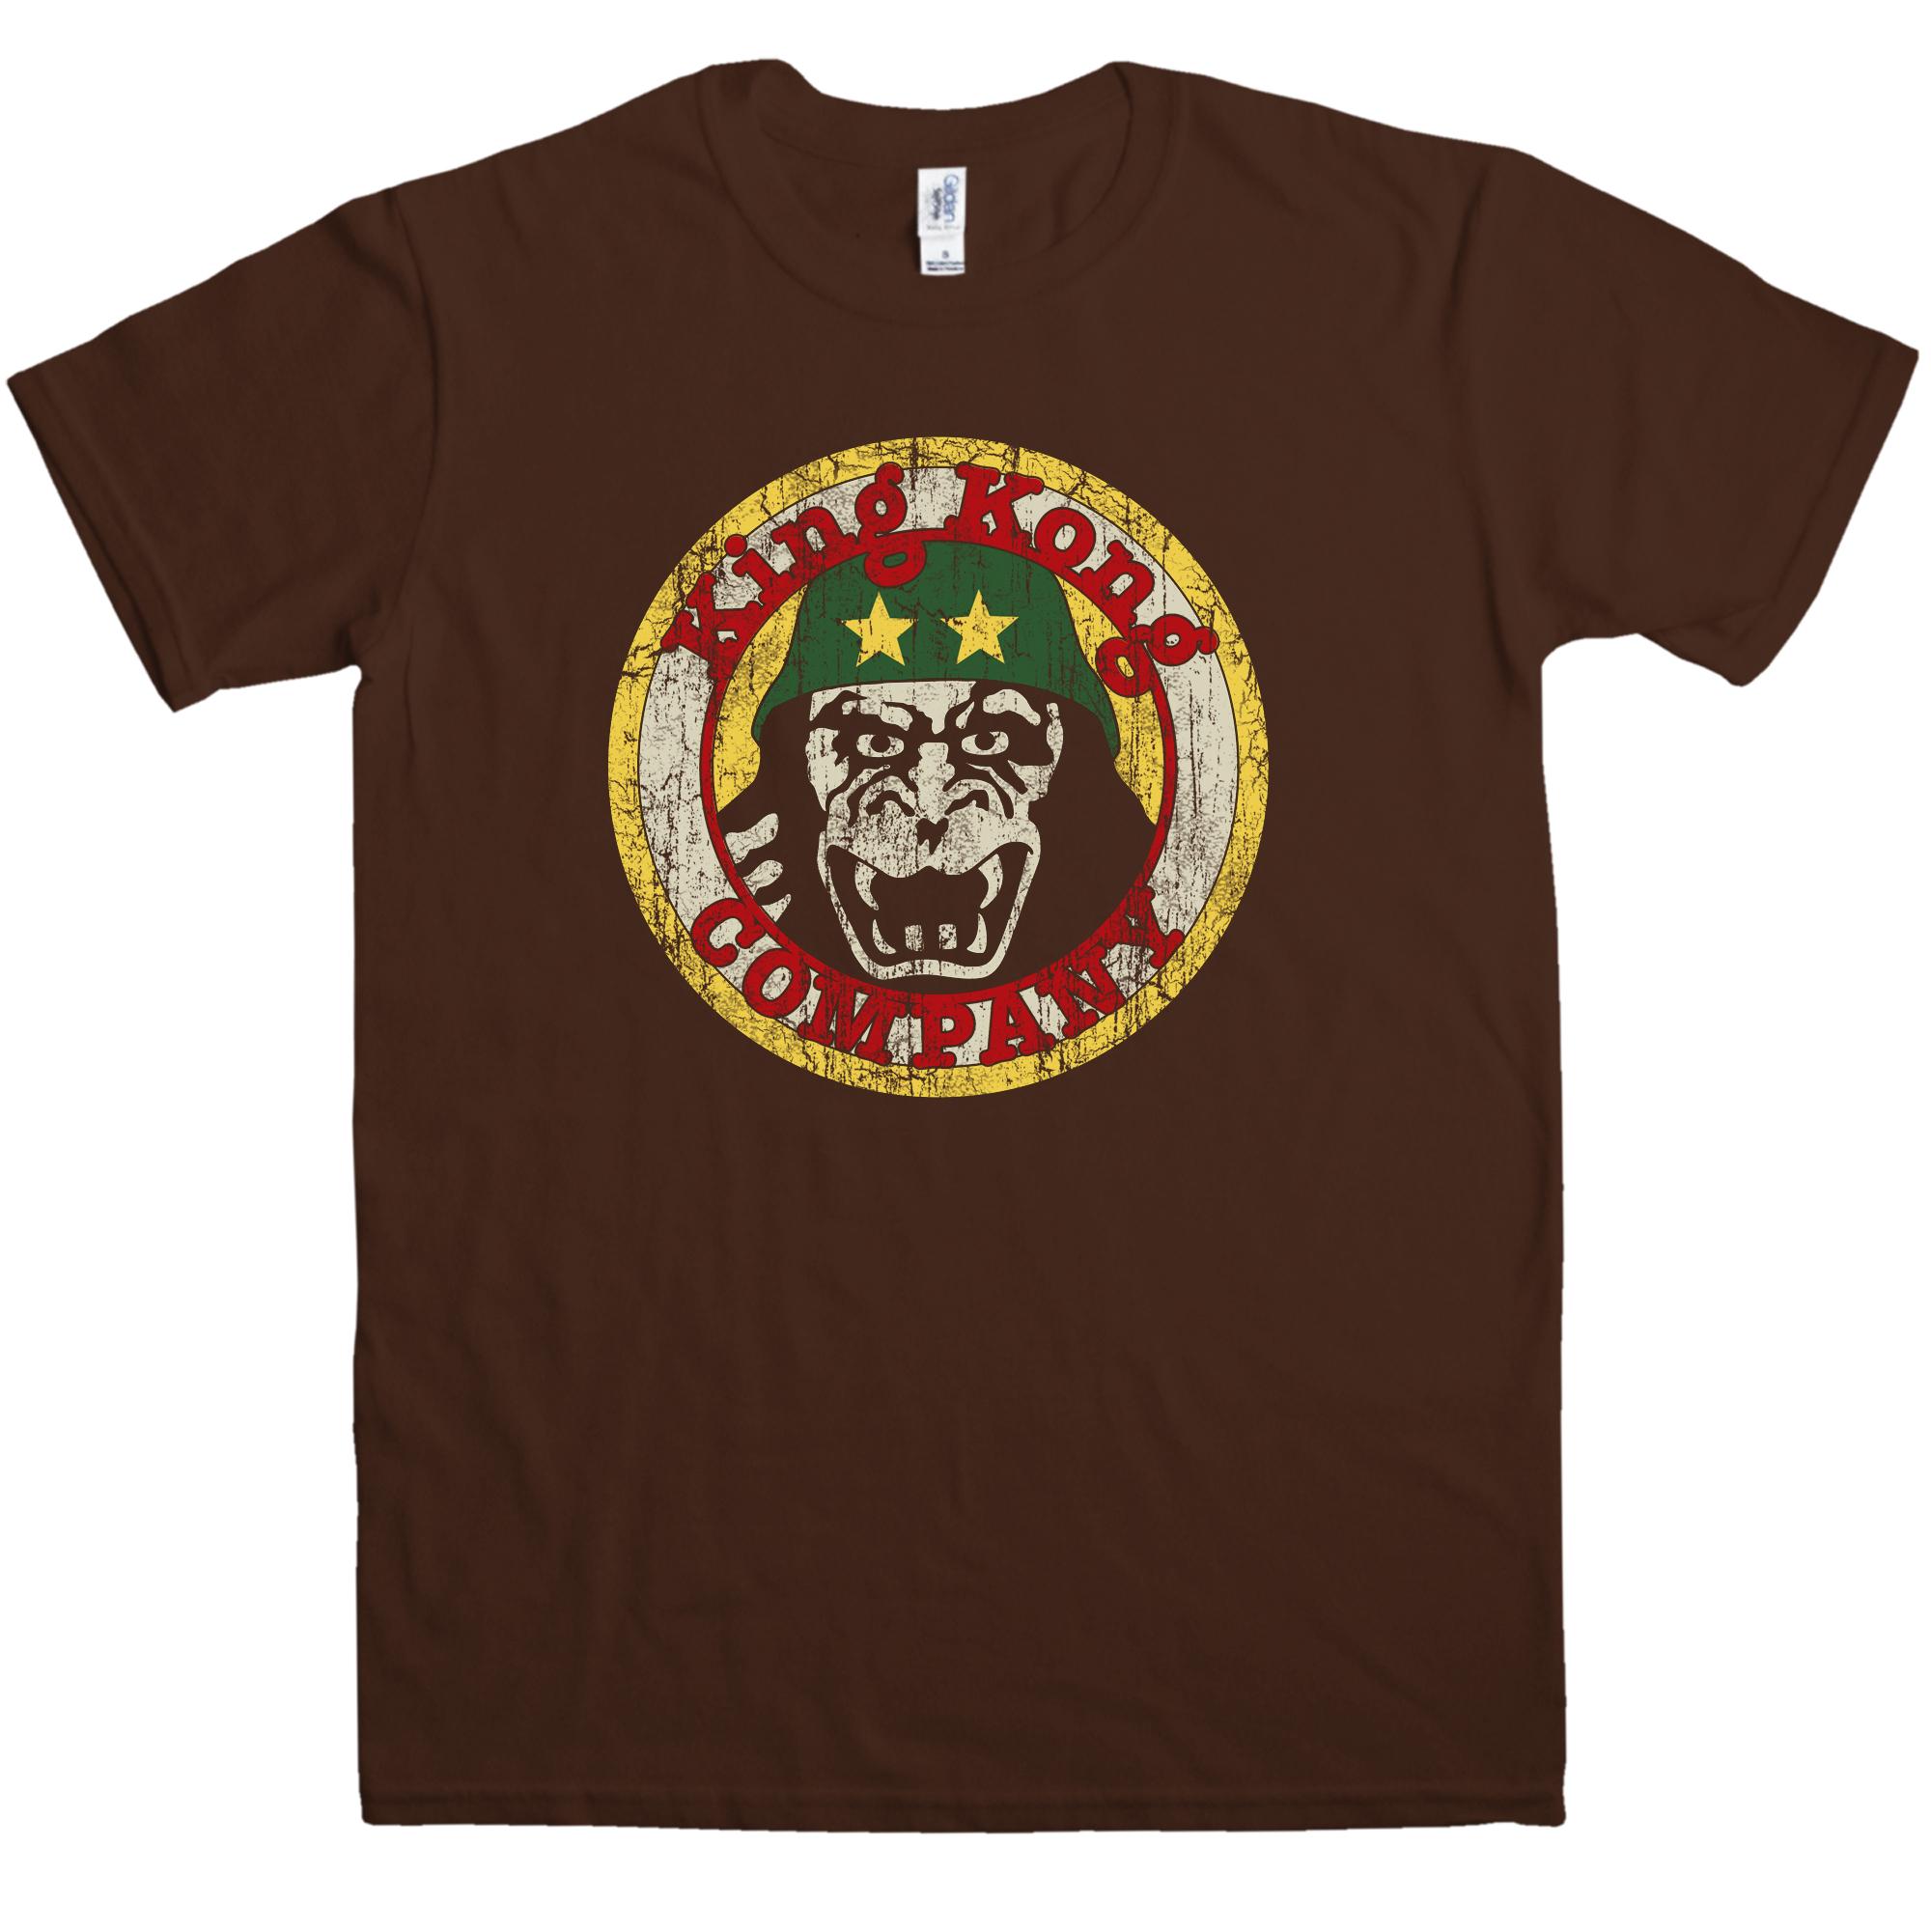 Mens T Shirt King Kong Taxi Company Ebay